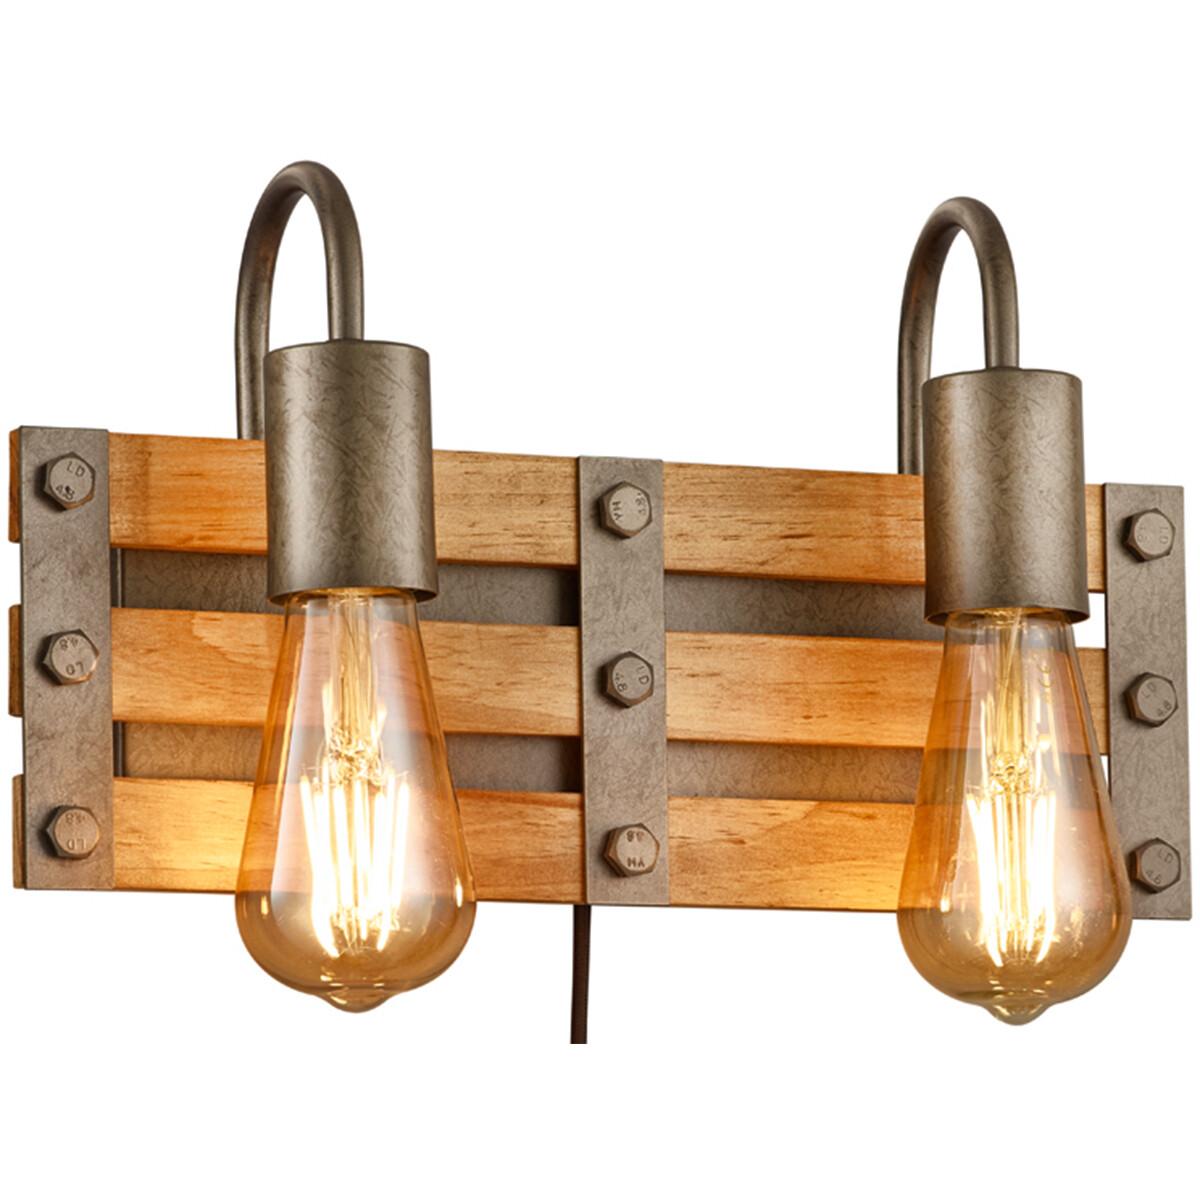 LED Wandlamp - Wandverlichting - Trion Khon - E27 Fitting - 2-lichts - Rechthoek - Mat Nikkel - Alum